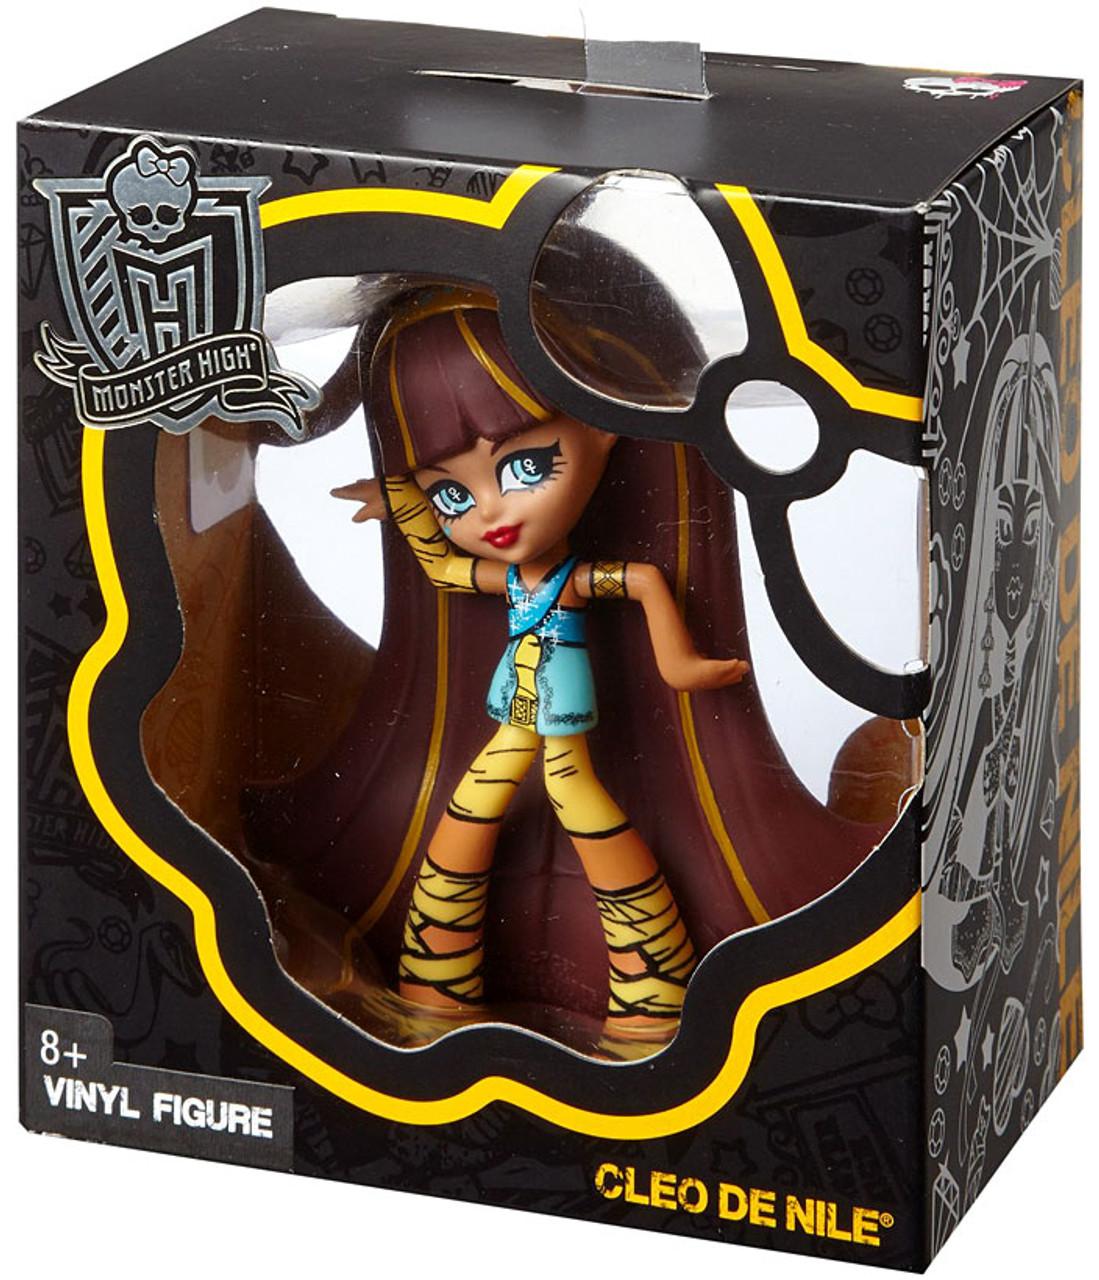 Worksheet. Monster High Cleo de Nile Vinyl Figure Mattel Toys  ToyWiz